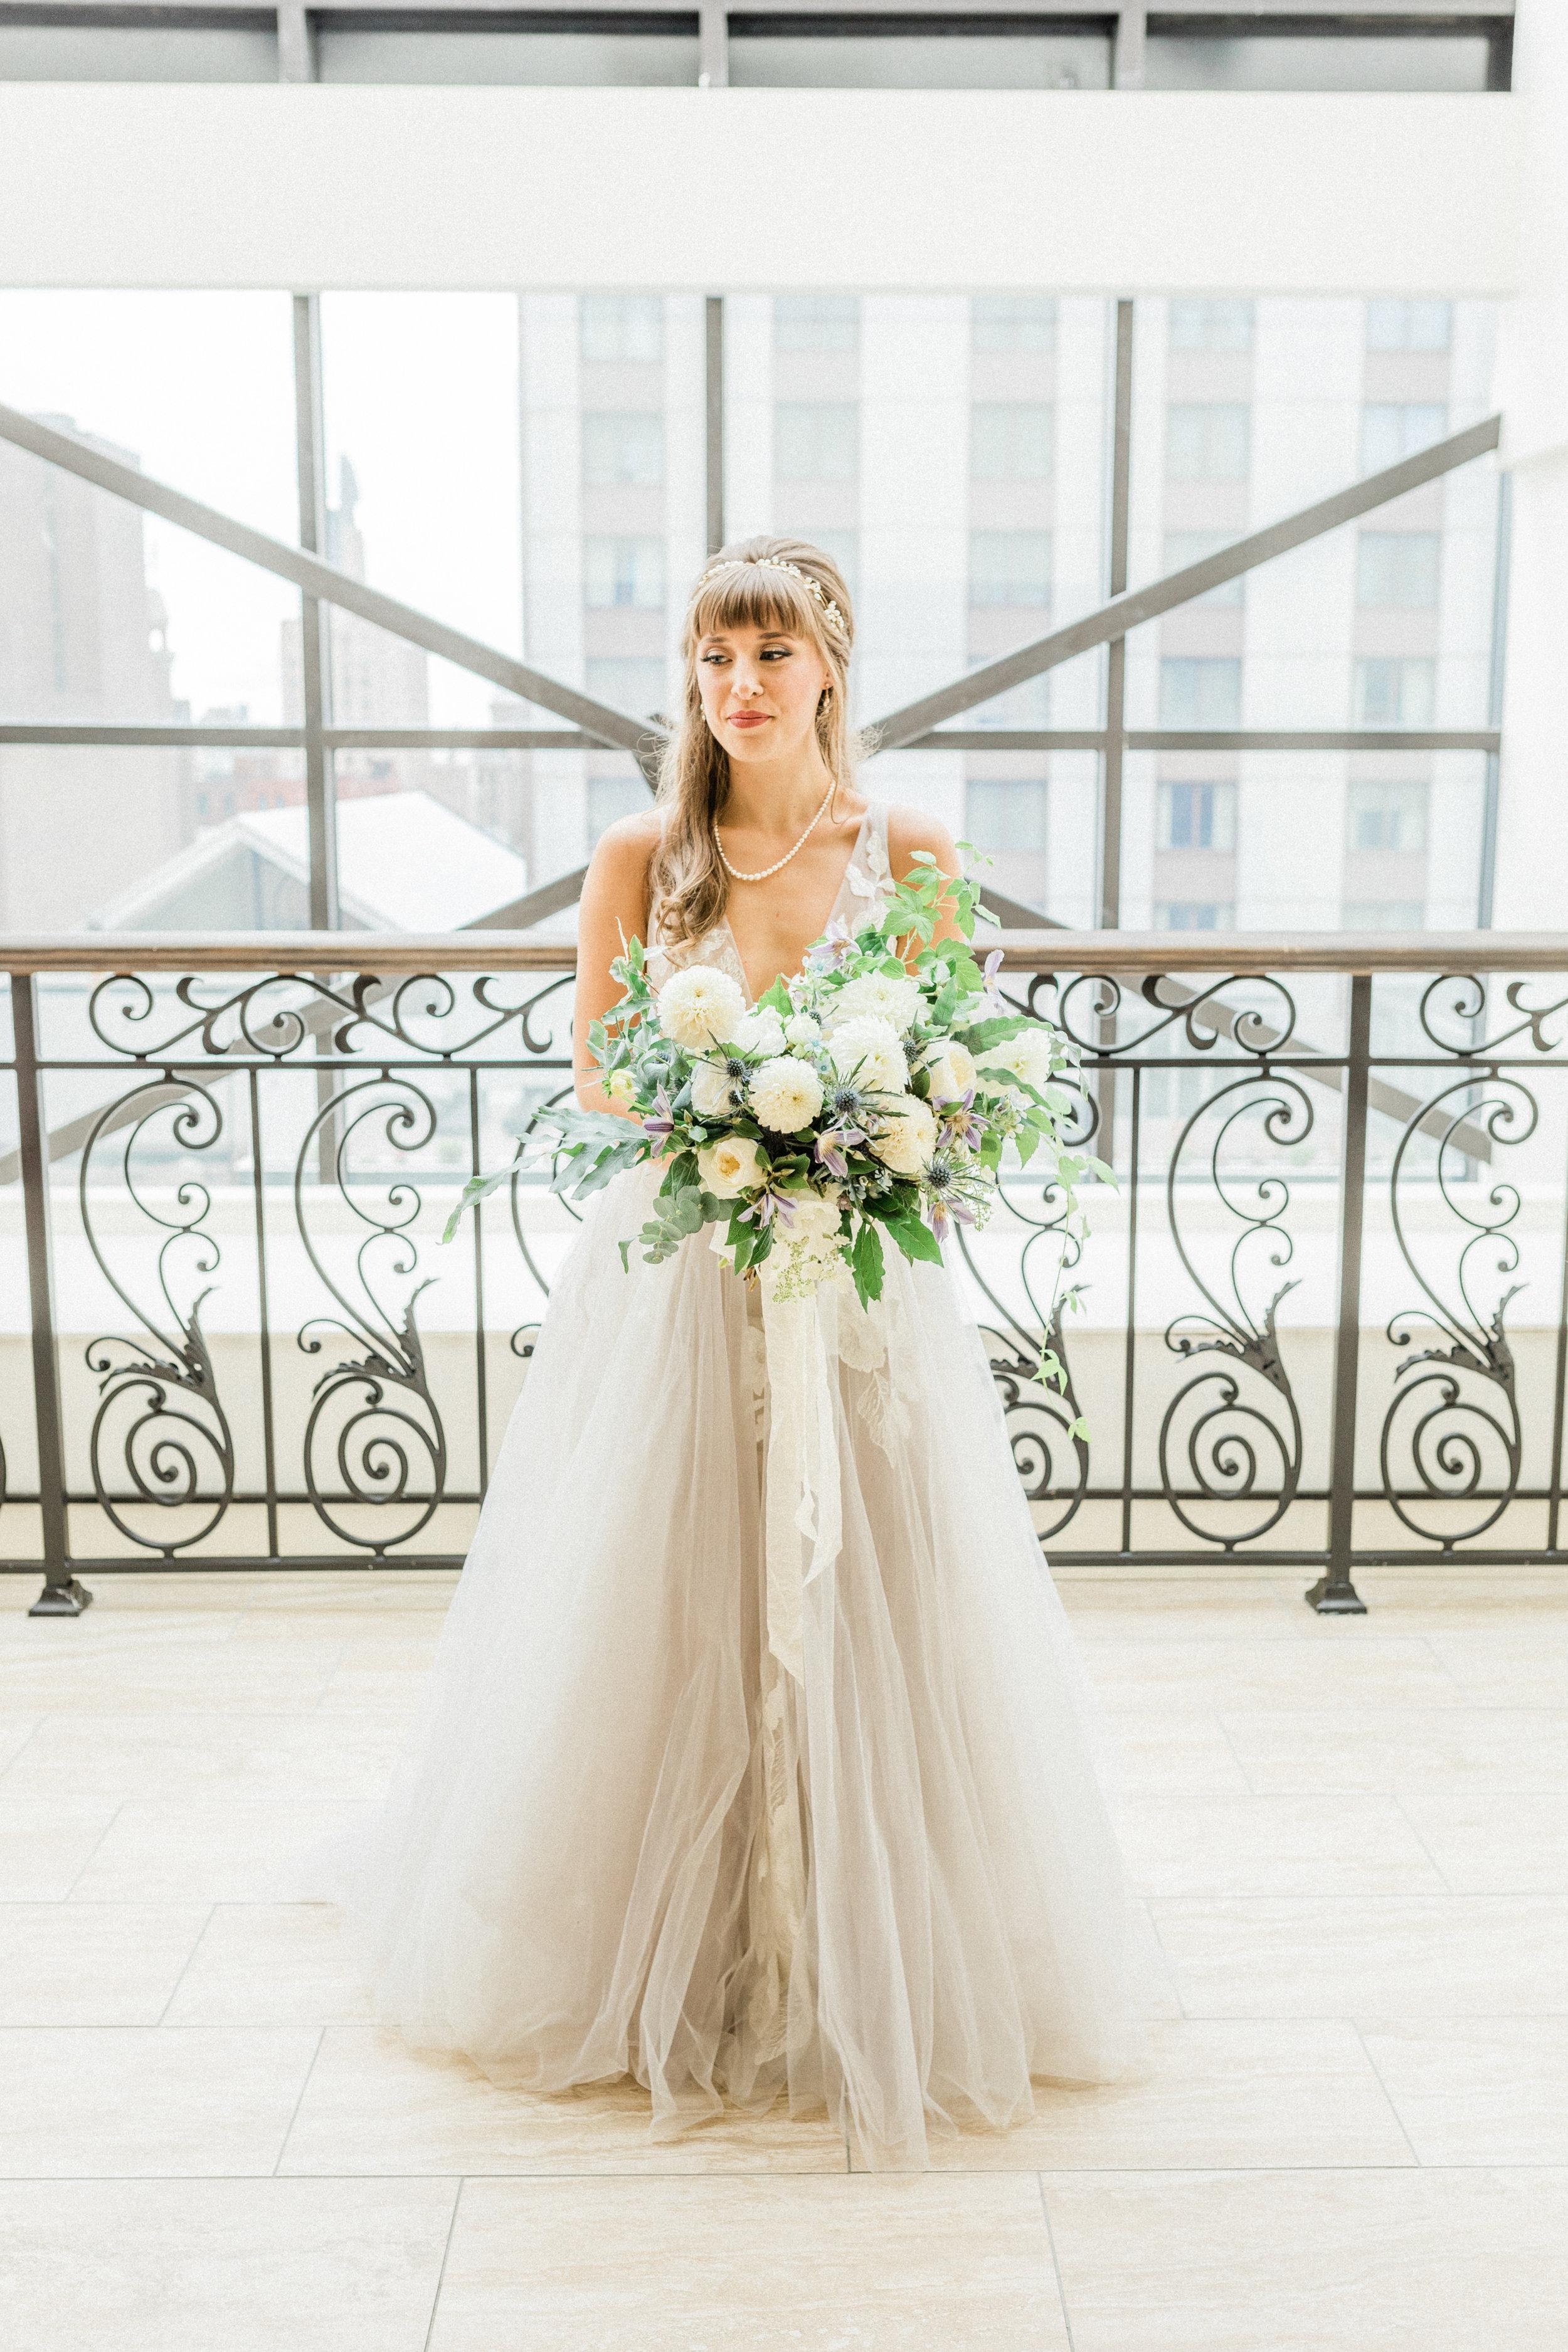 Mallory and Aaron - Married - Sneaks - Lauren Alisse Photography-15.jpg